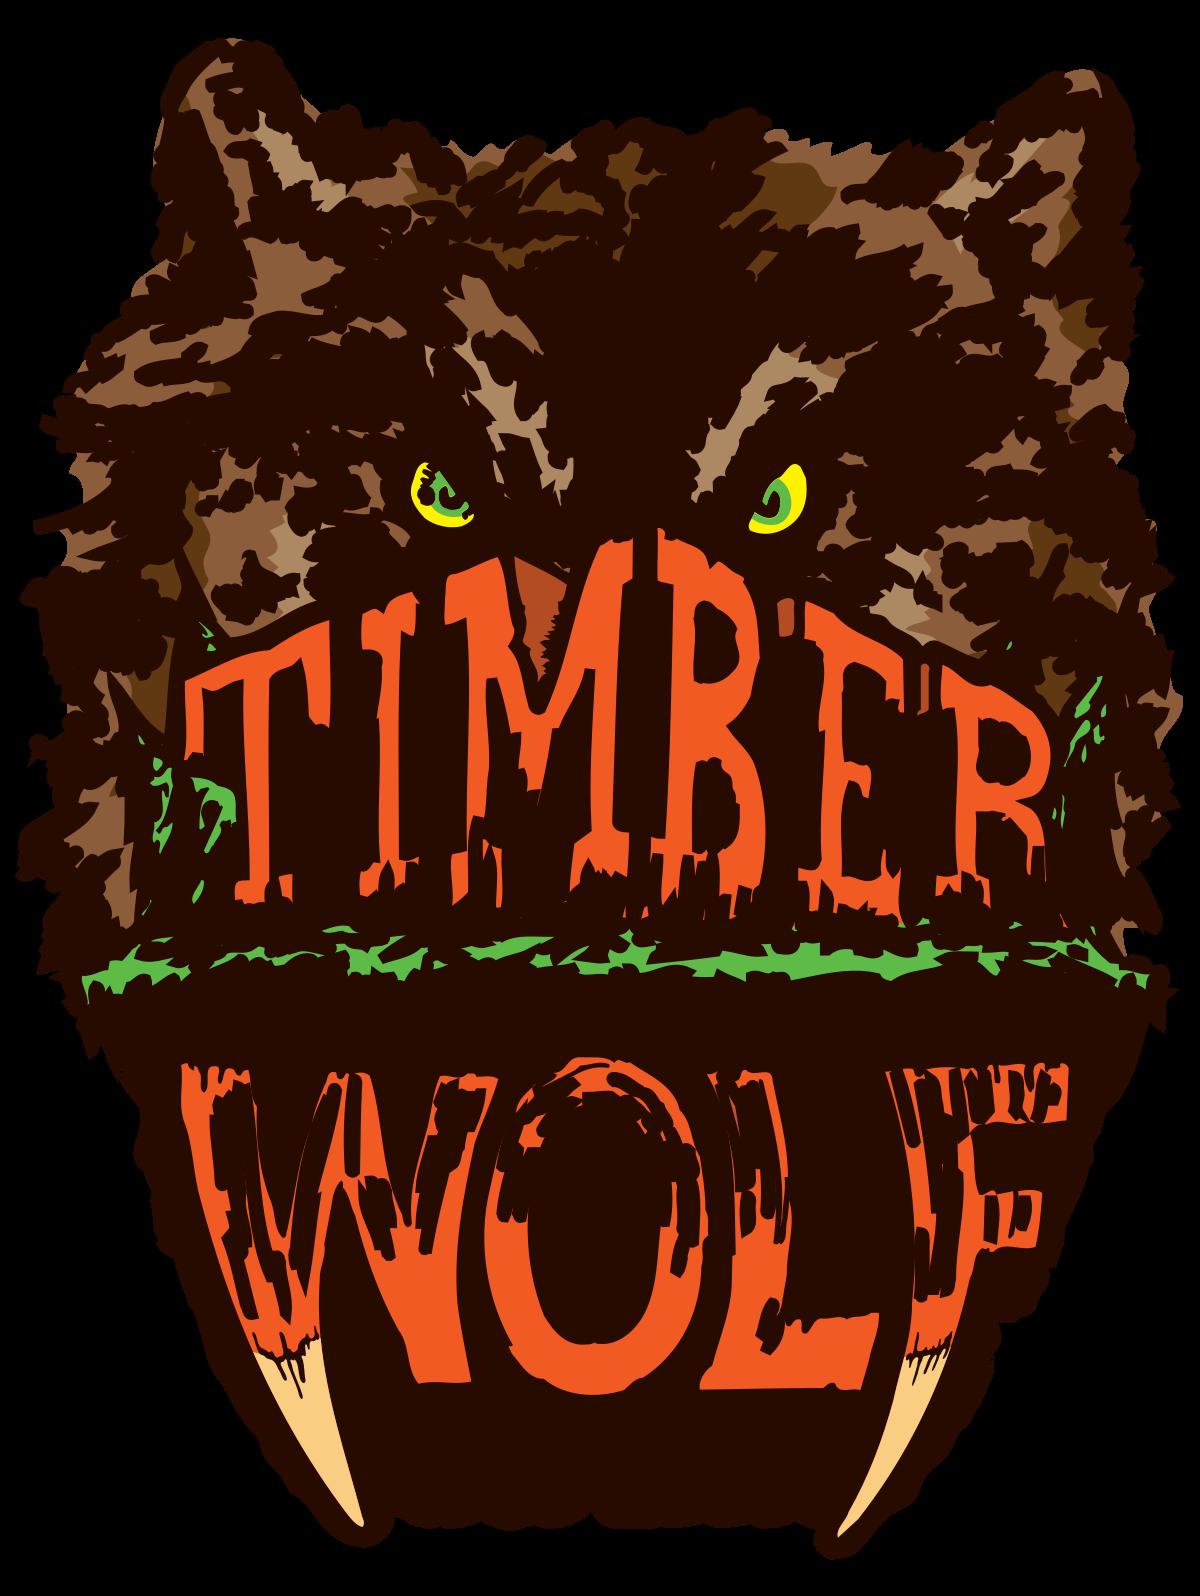 Timber wolf wikipedia . Fair clipart fun roller coaster